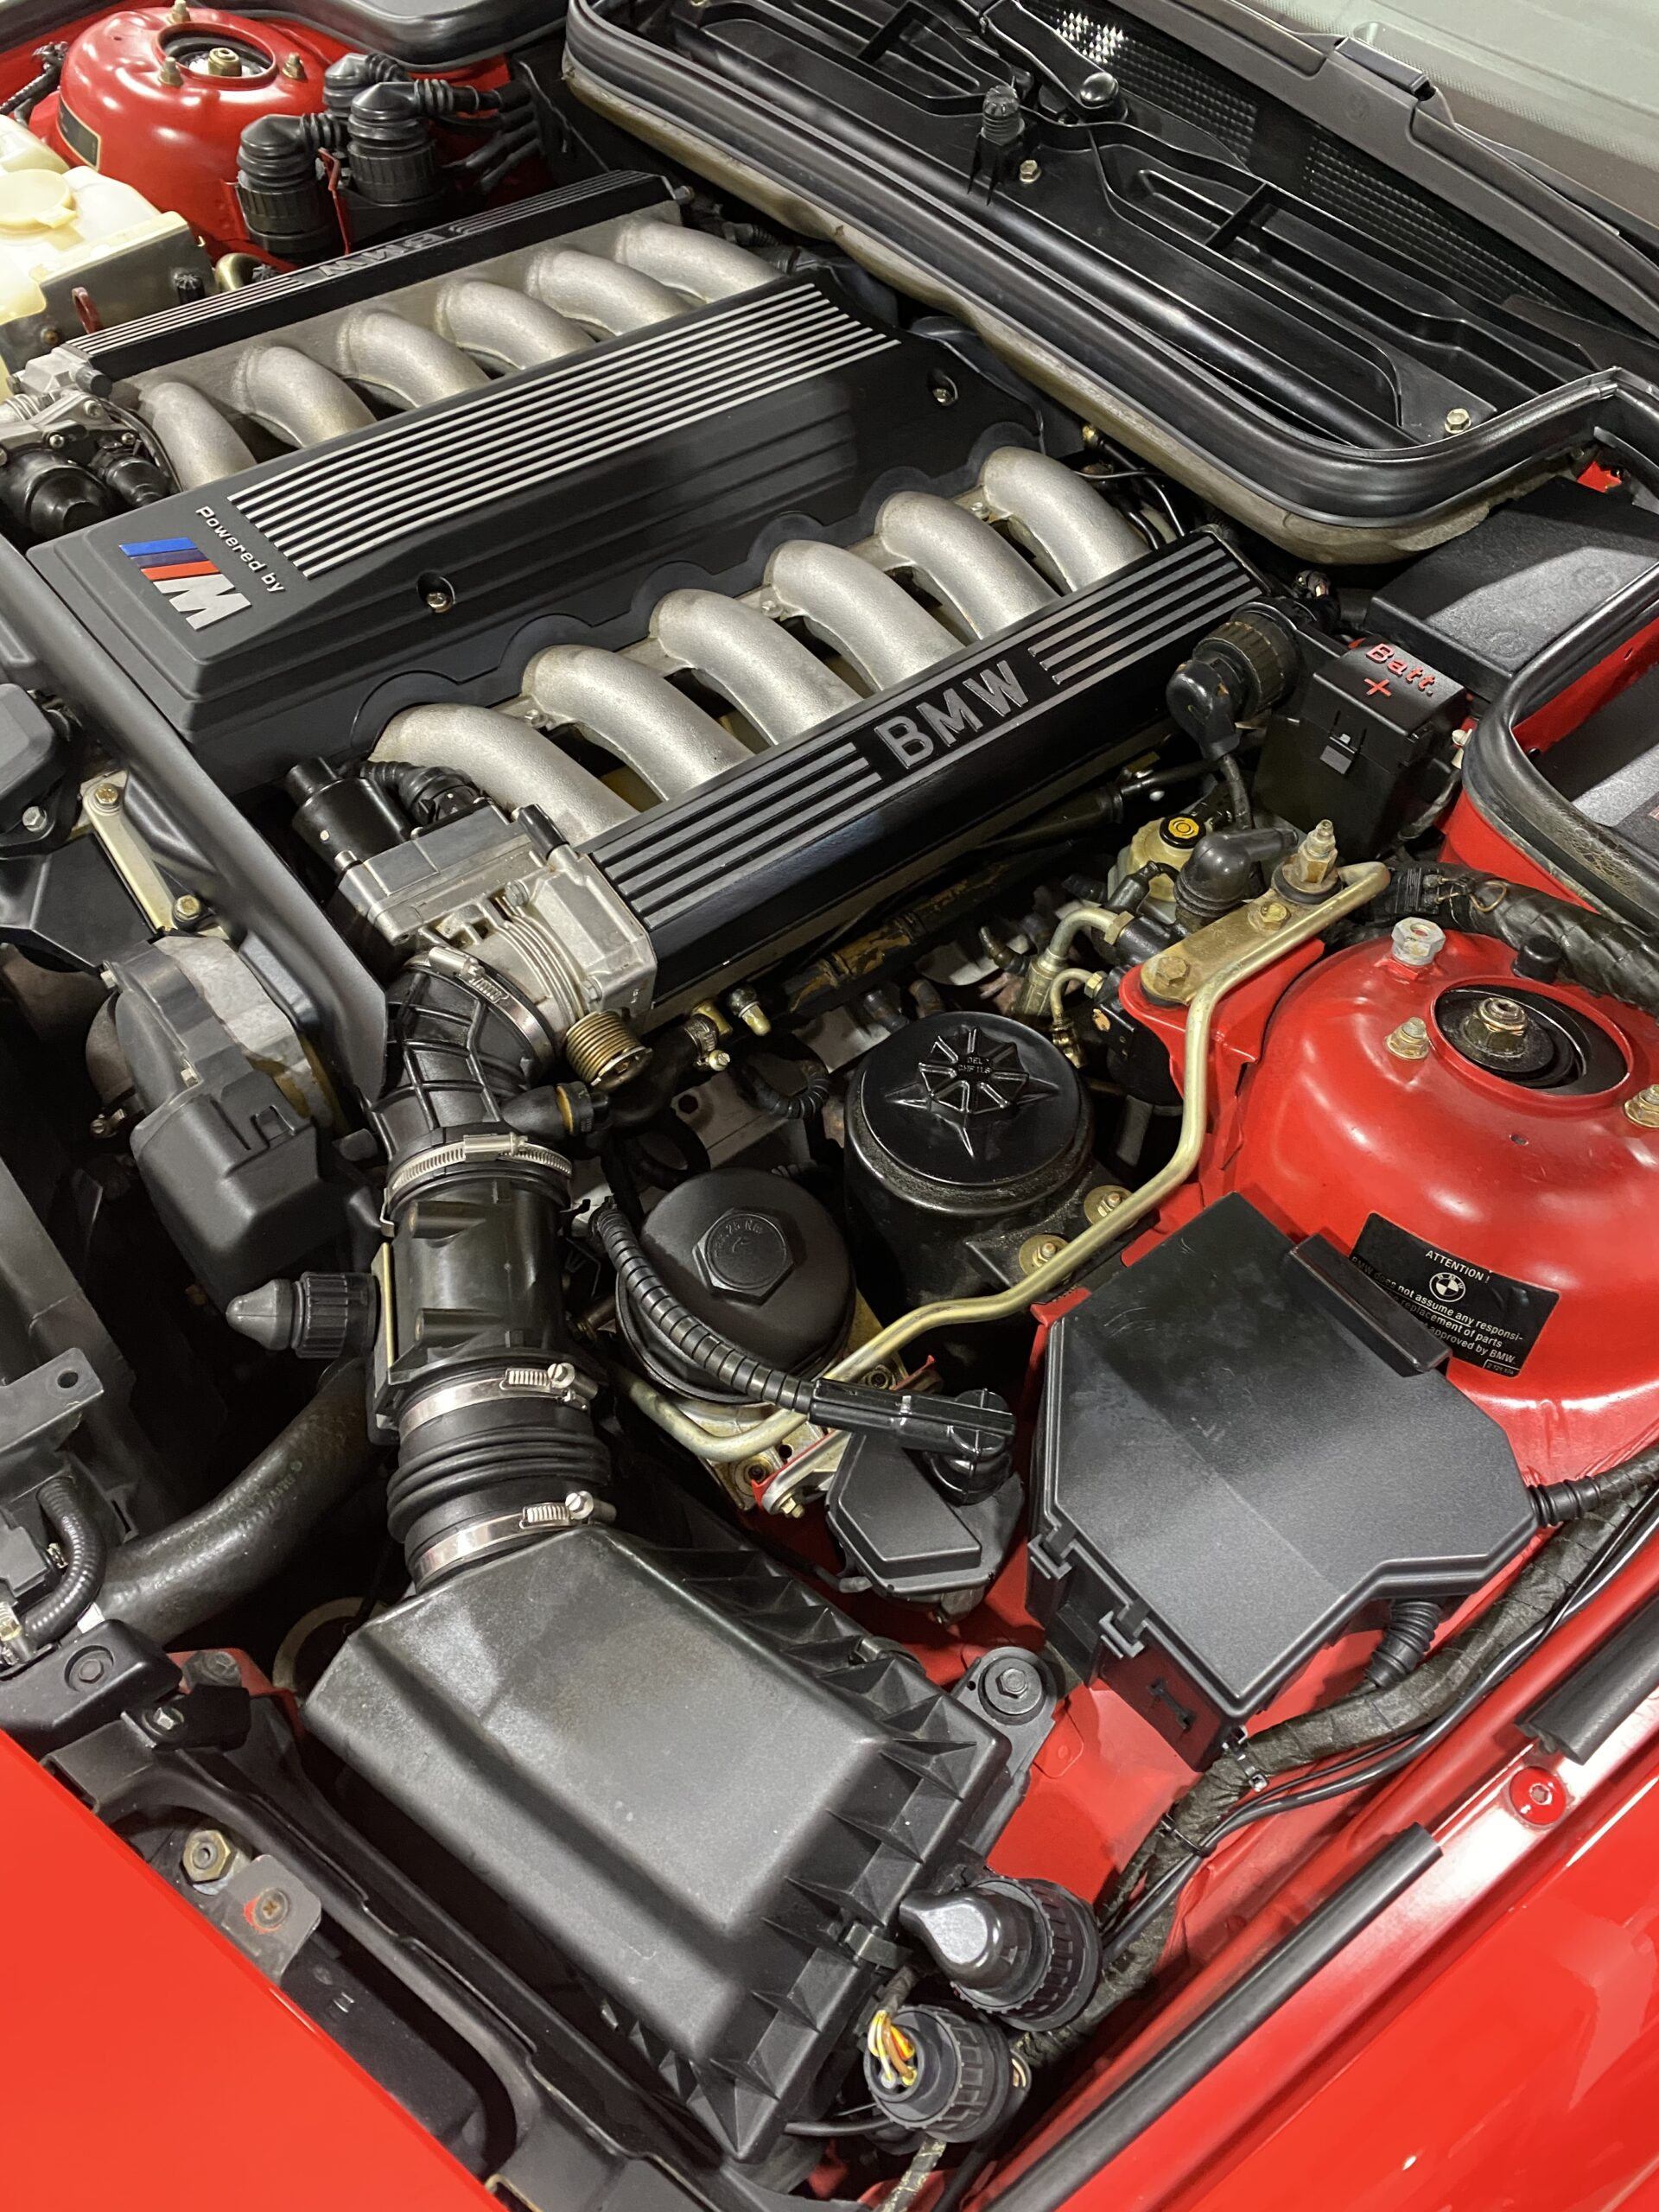 1994 BMW 8-Series E31 850CSI Rare 1 of 225 US Cars-Only 74k Miles-V12 6 Speed-Original Window Sticker-2 Owner